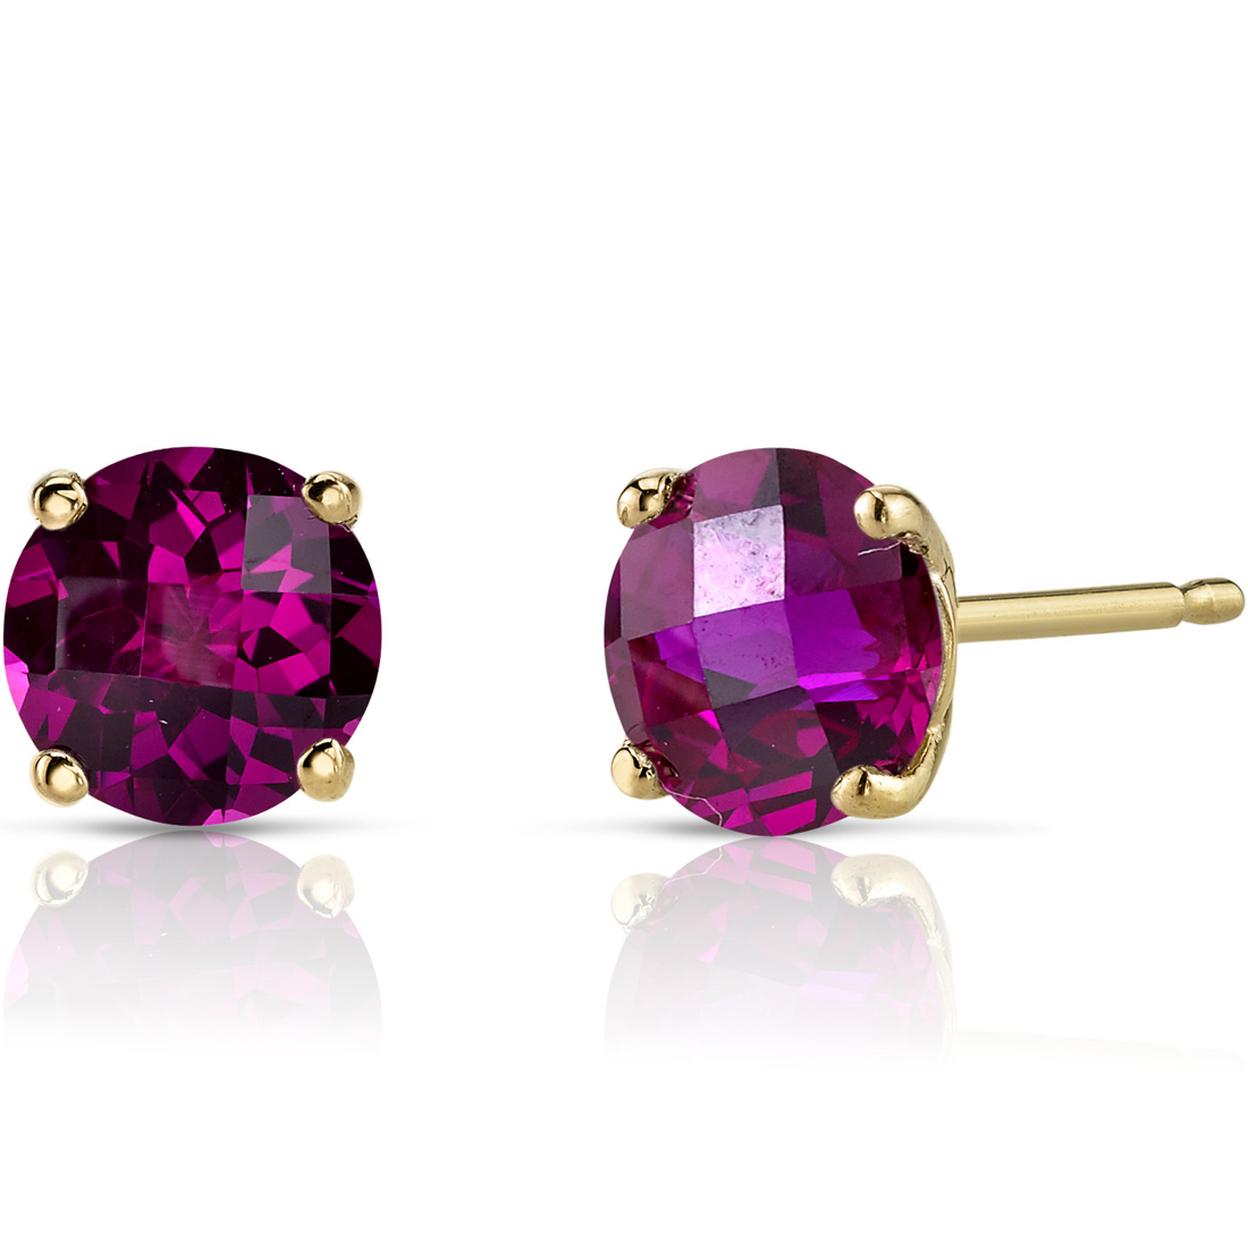 Oravo 14k Yellow Gold 2 1/4ct Tgw Created Ruby Round-cut Stud Earrings